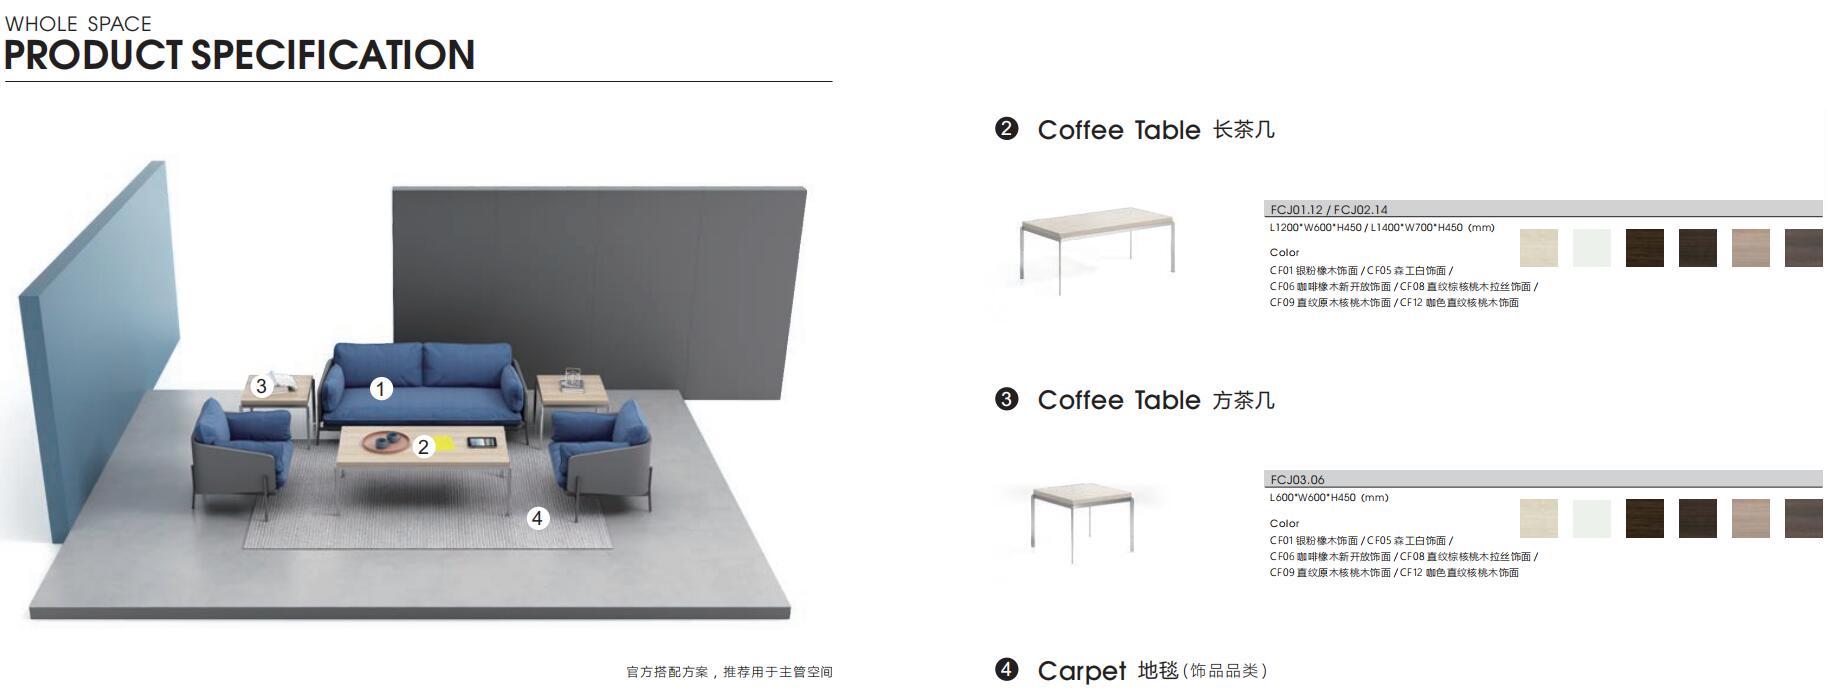 Suyi舒意系列布艺老款友博国际棋牌沙发官方推荐配套